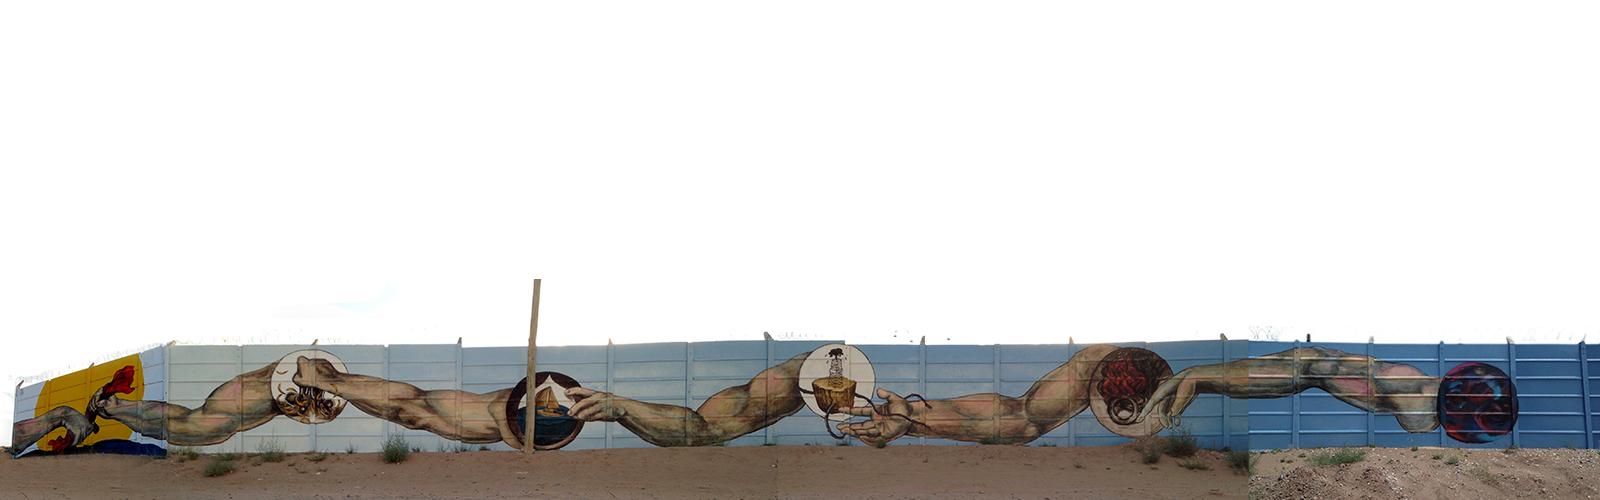 plumas-new-mural-in-neuquen-argentina-10